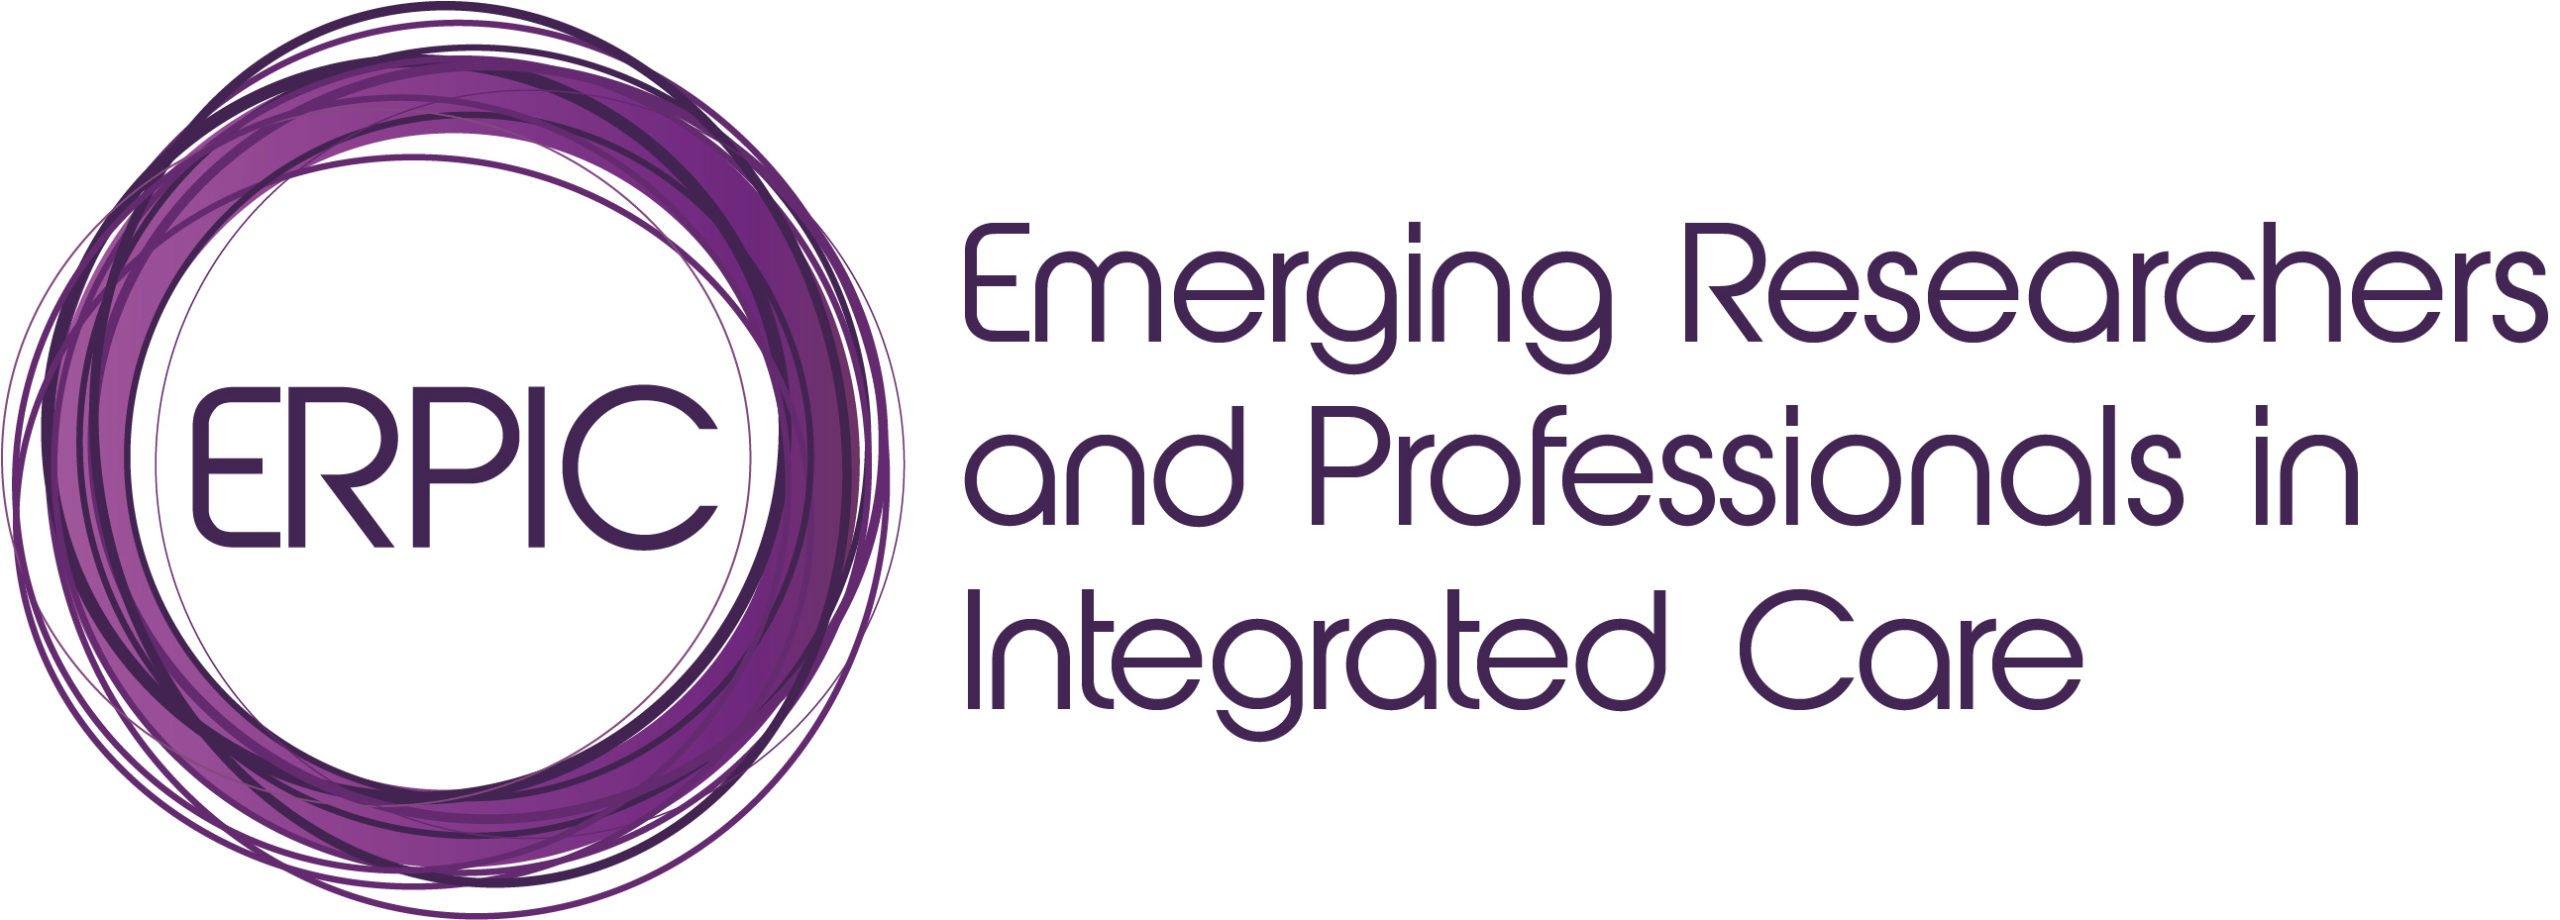 ERPIC Journal Club - Meeting 5